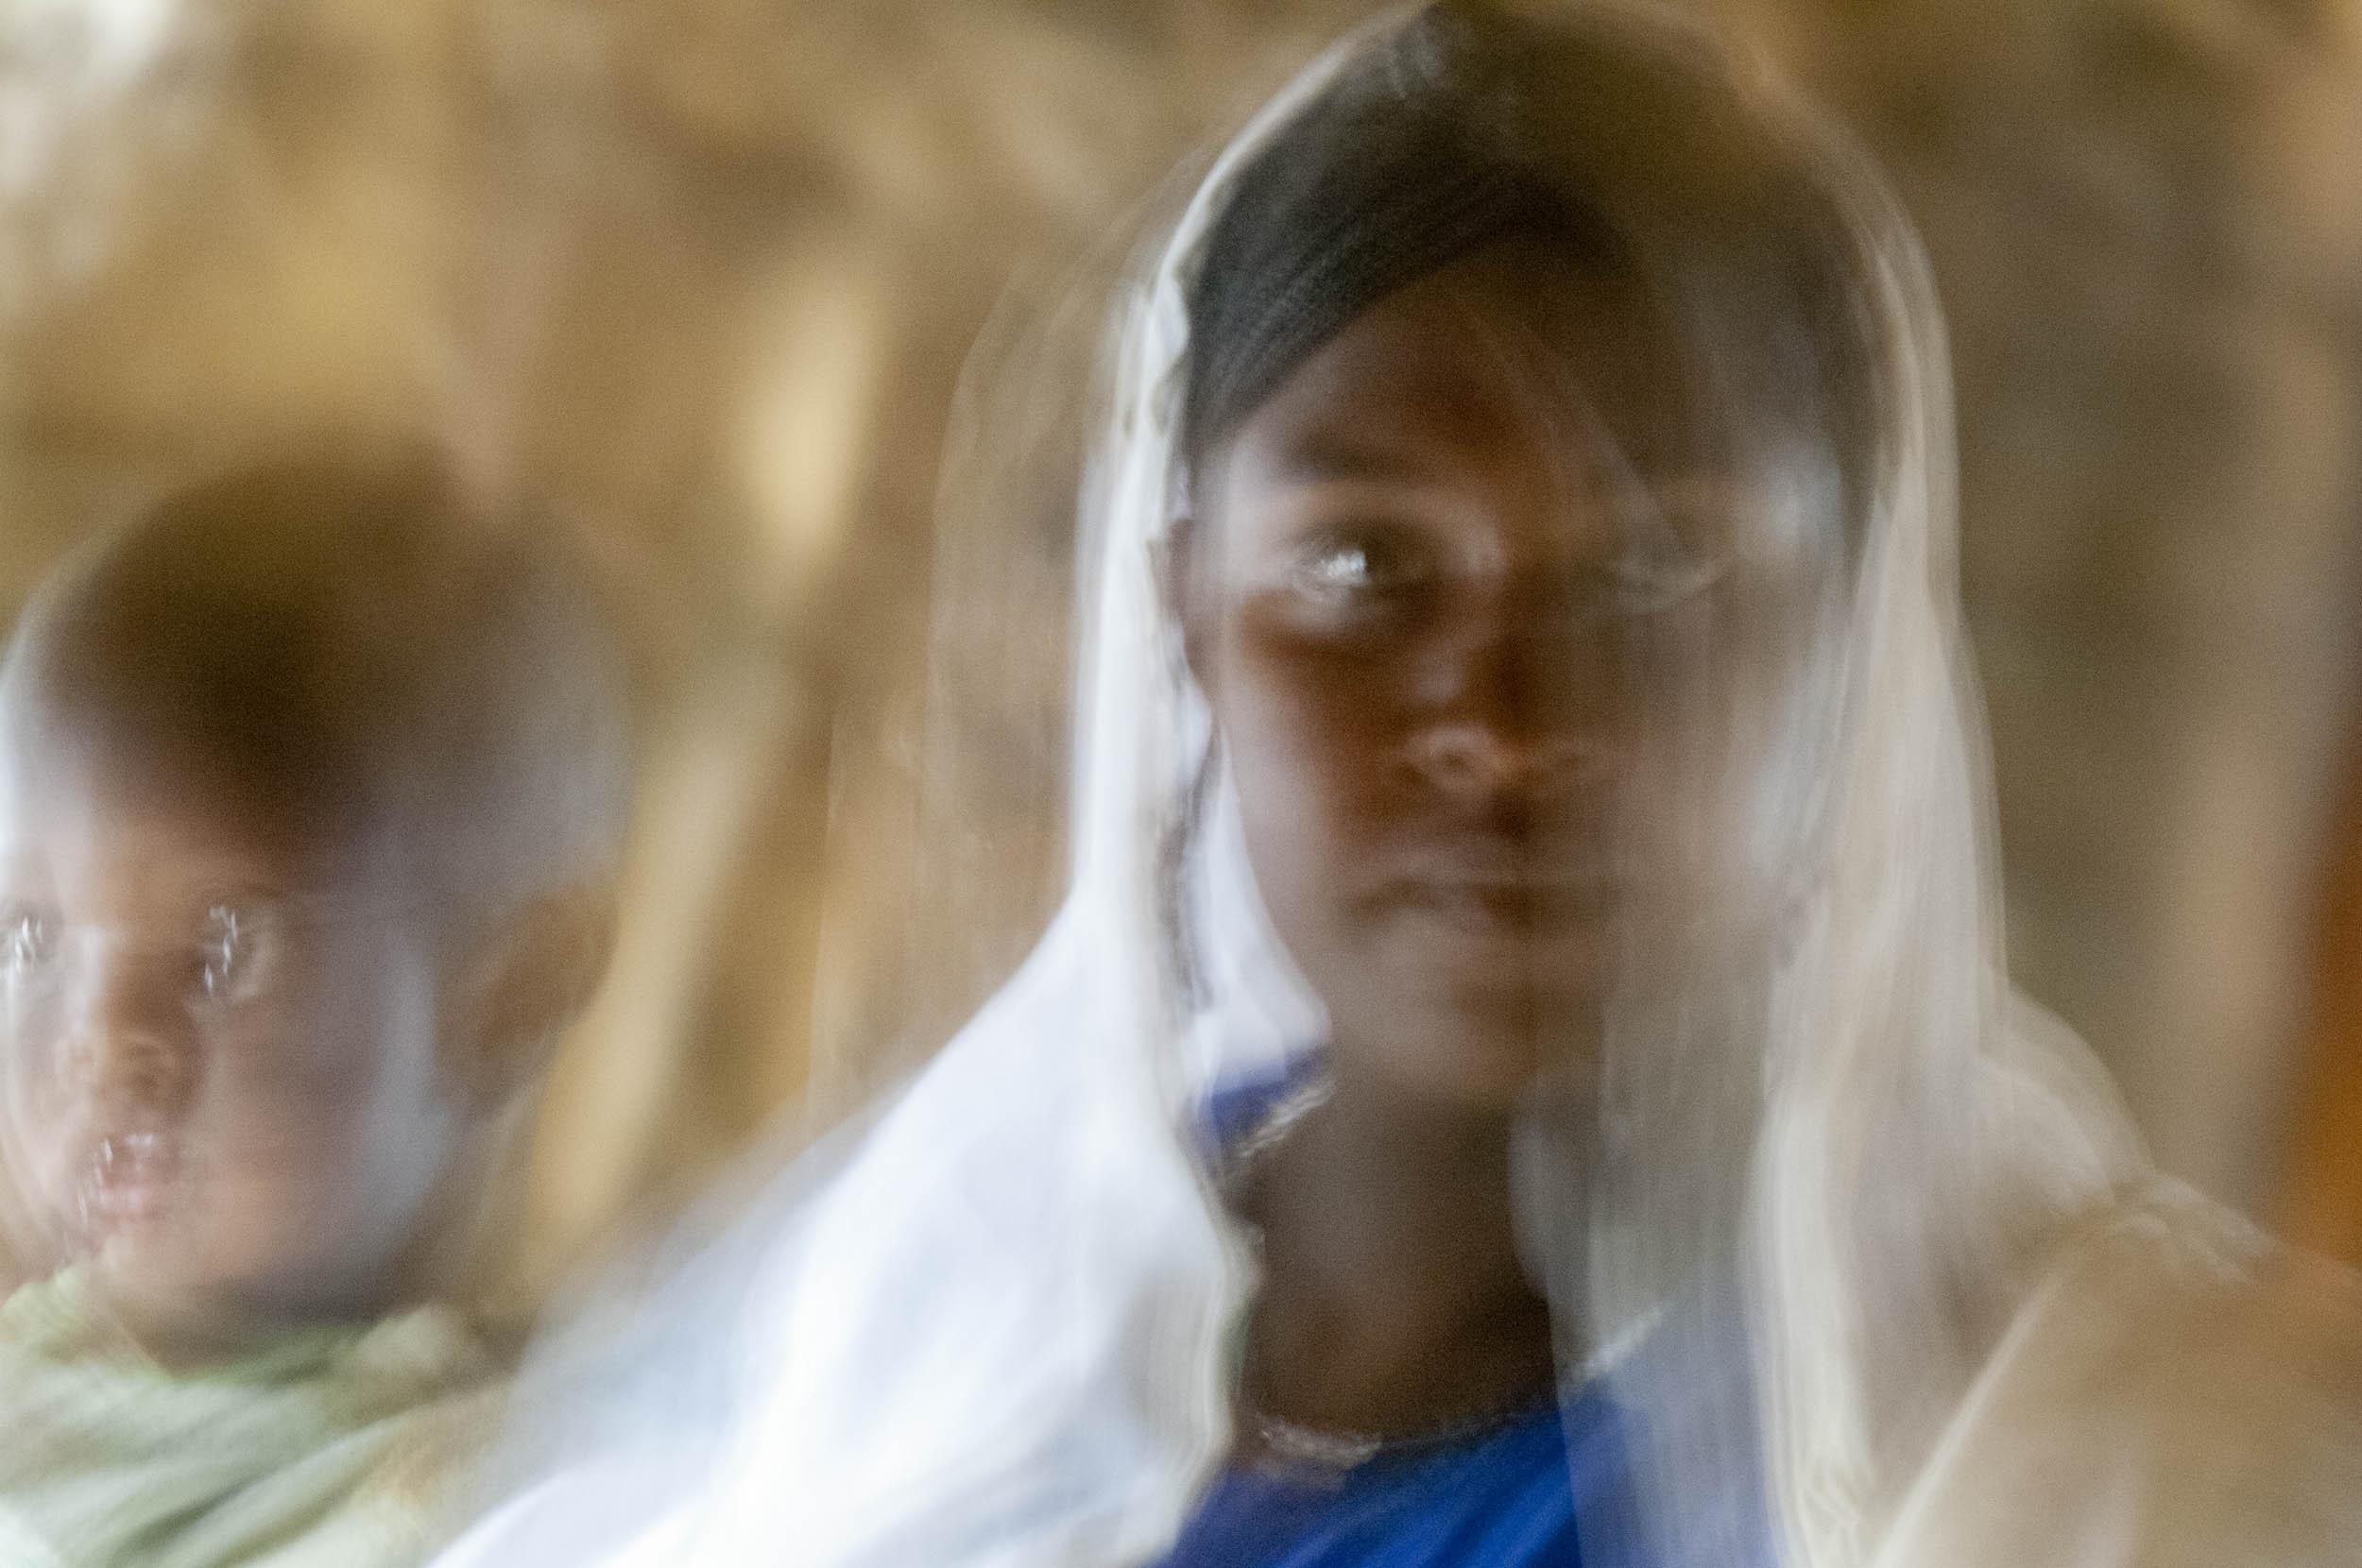 Touareg, Burkina Faso - Ethnos - Hector Garrido, Aerial and human photography